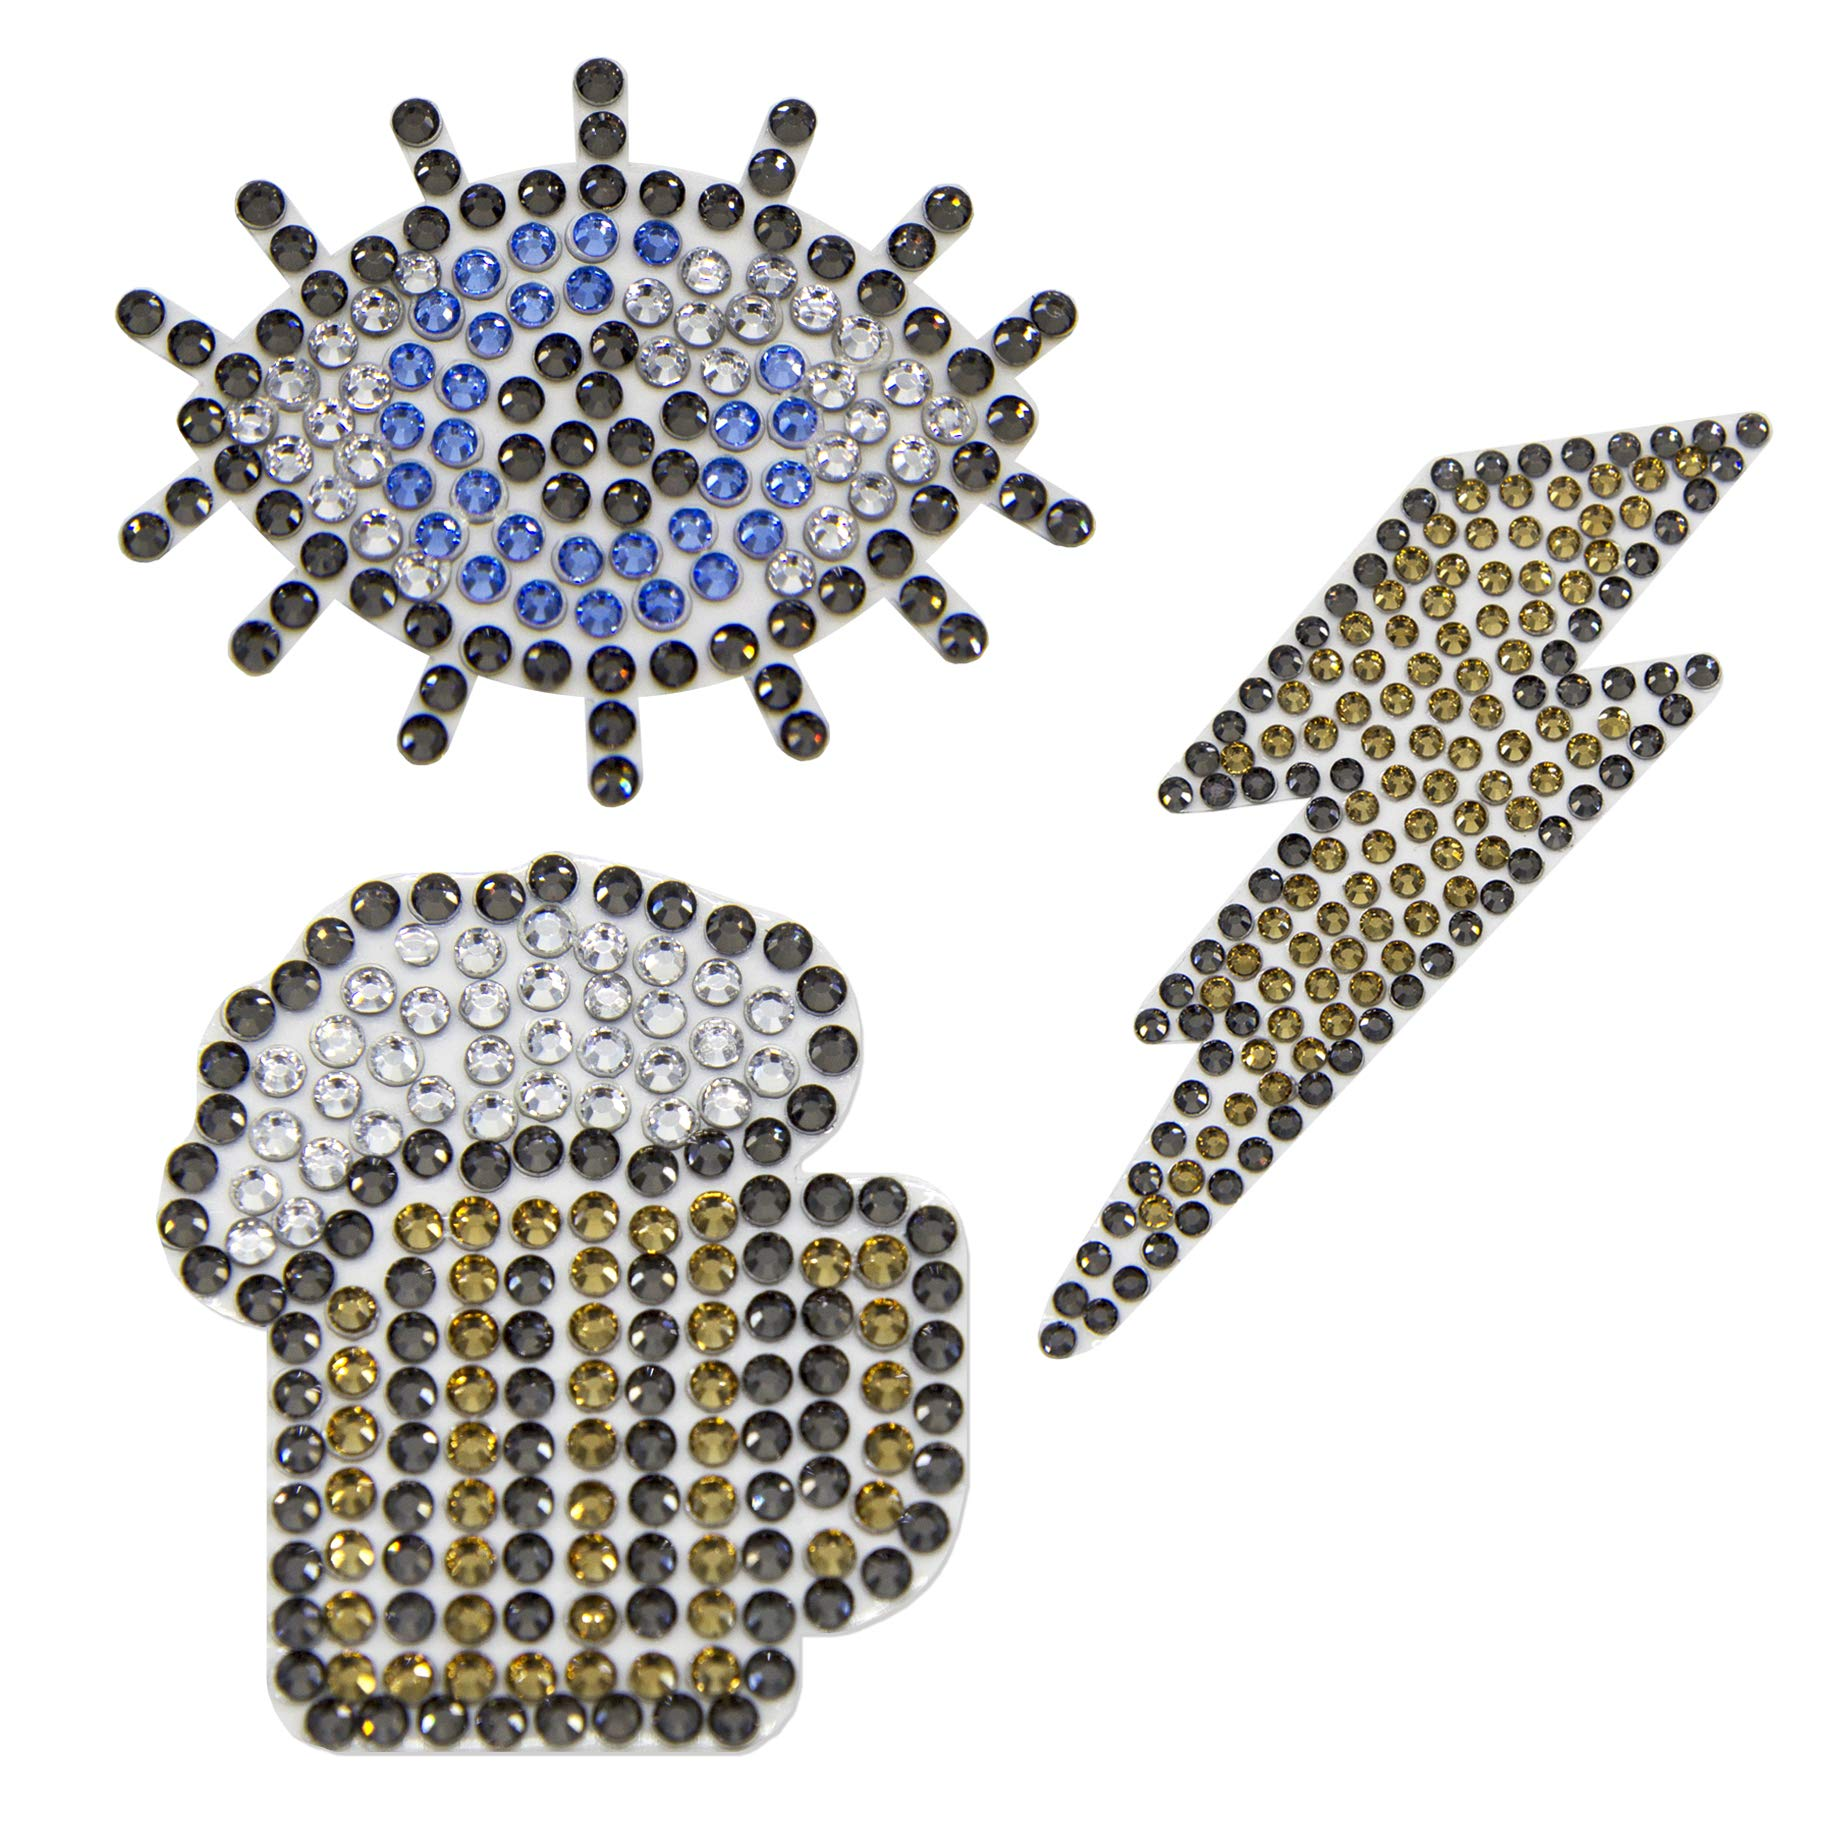 CRYART Crystal Patch, Sticker, Decoration, Transparent Sheet, Flat Back Crystal (Draft Beer, 2x2.3 inch, Medium/Pupil, 2.5x2 inch, Medium/Lightning, 2x2.1 inch, Small)